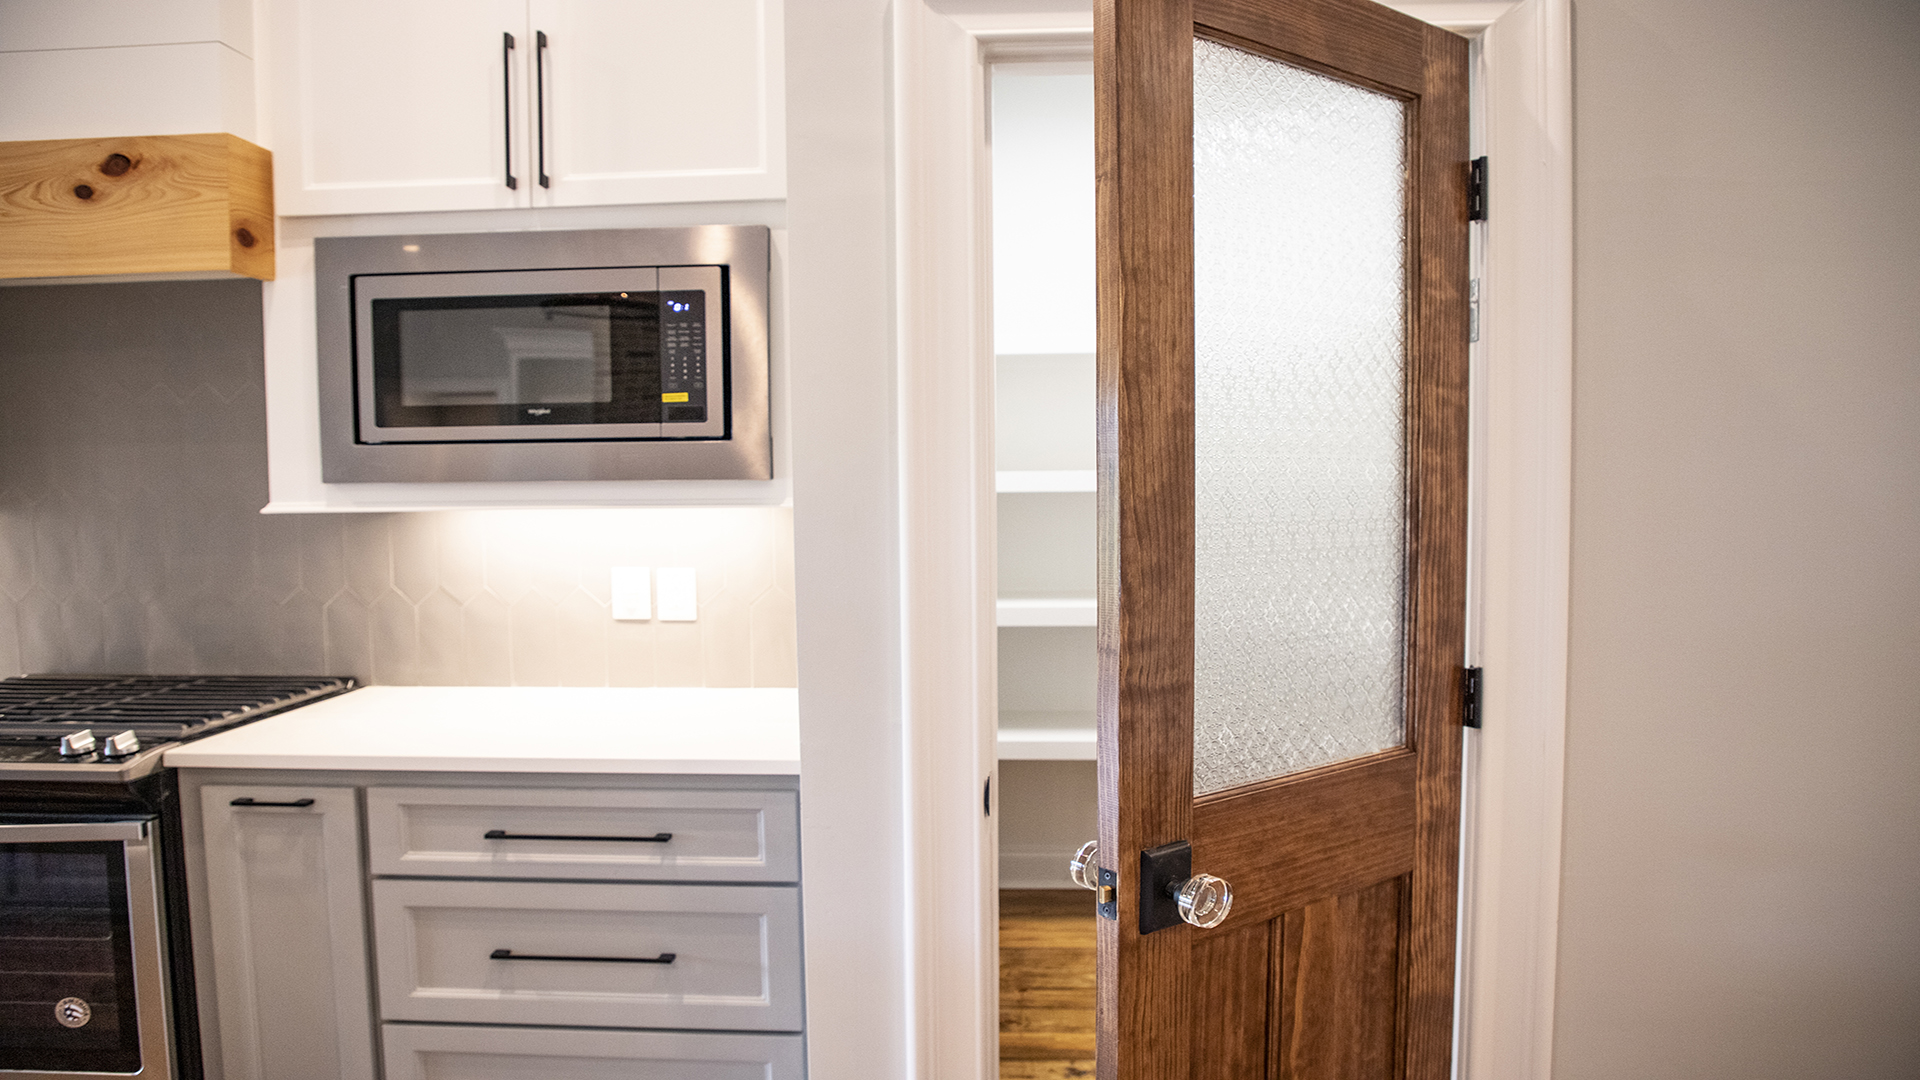 walk in pantry glass and wood door glass door knob built in microwave brandon mississippi